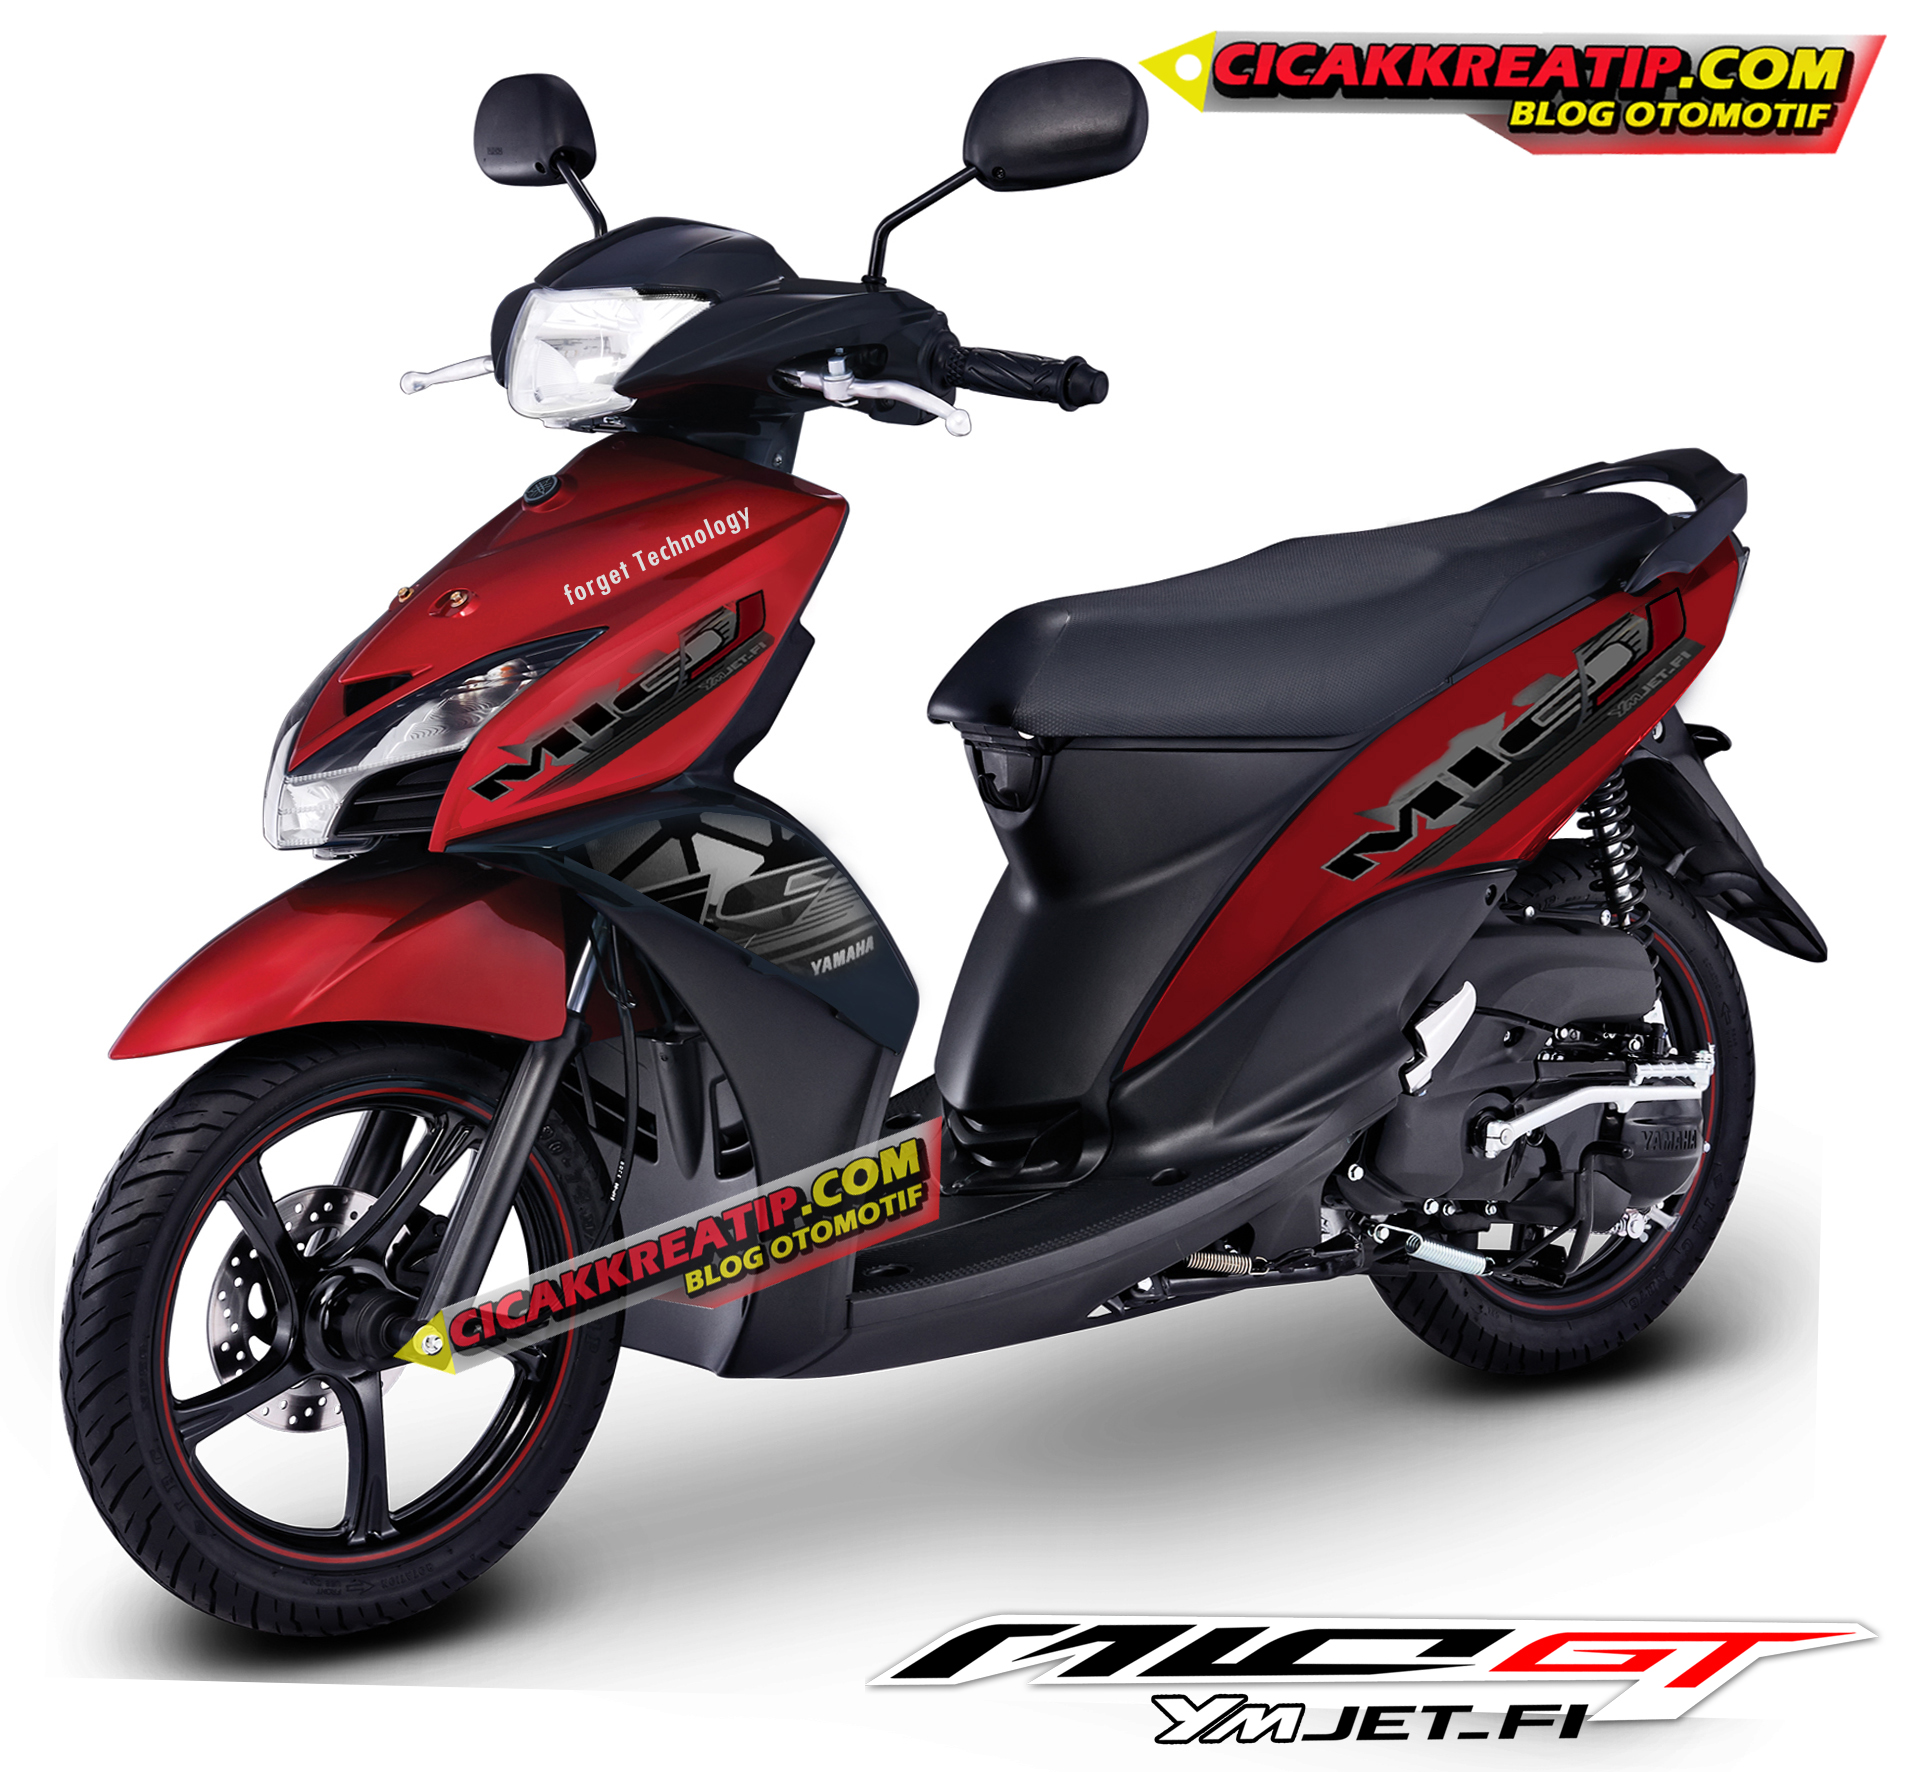 Ide 63 Modifikasi Yamaha Mio Gt 2014 Terkeren Kempoul Motor